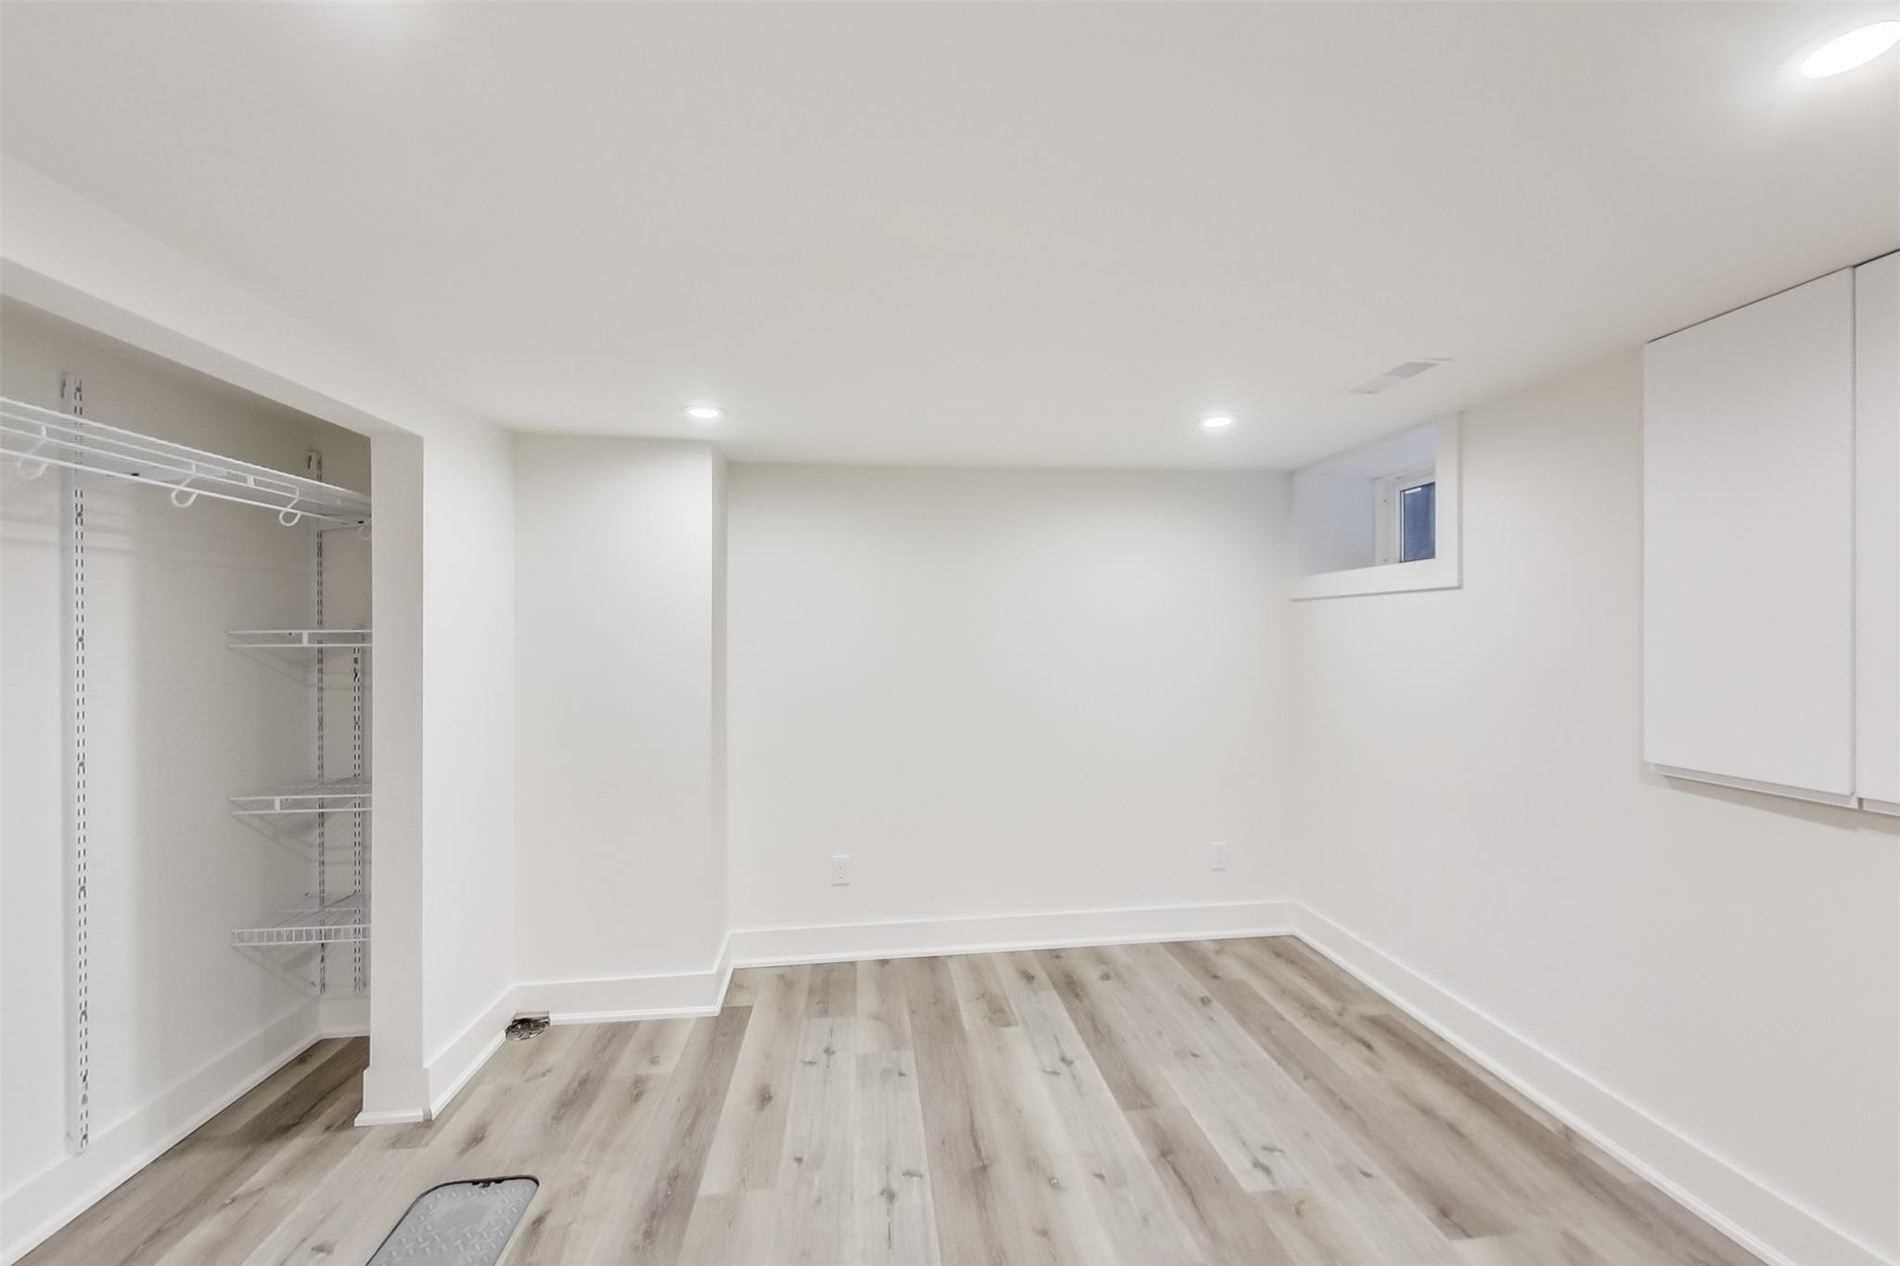 Photo 12: Photos: 501B Carlaw Avenue in Toronto: South Riverdale House (2 1/2 Storey) for lease (Toronto E01)  : MLS®# E4800704